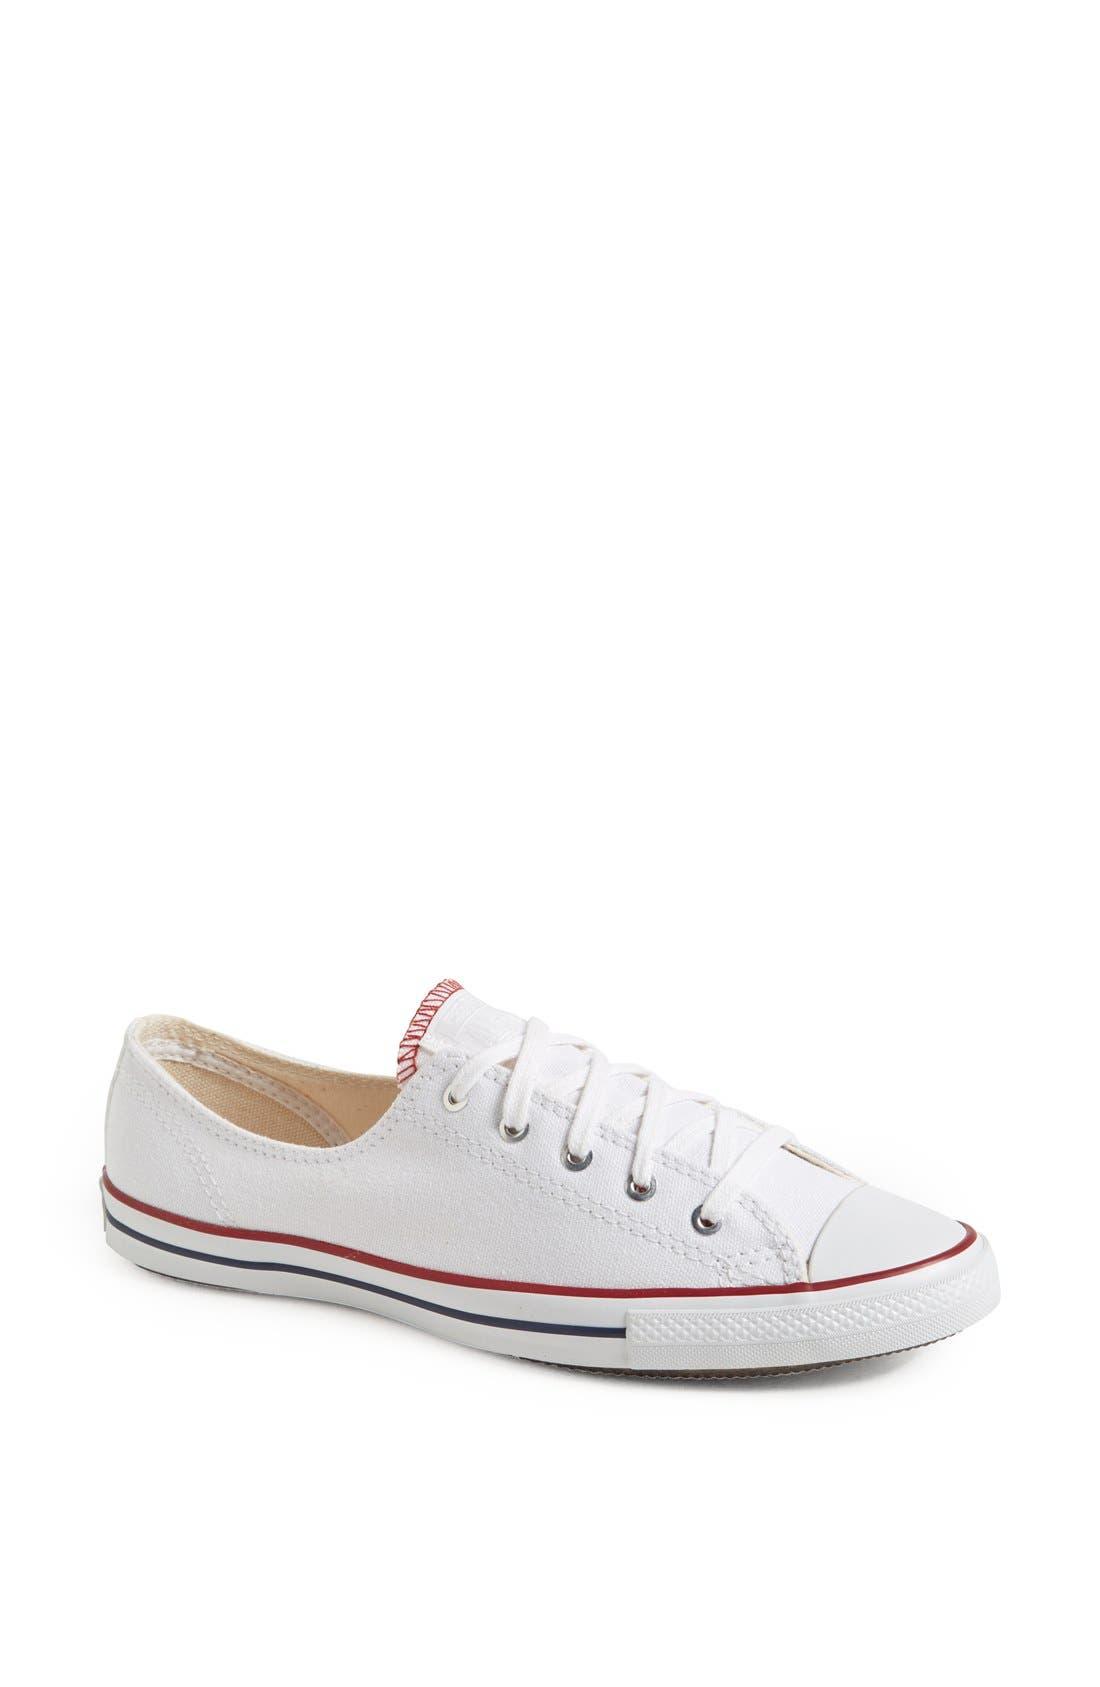 Main Image - Converse Chuck Taylor® All Star® 'Fancy Ox' Sneaker (Women)